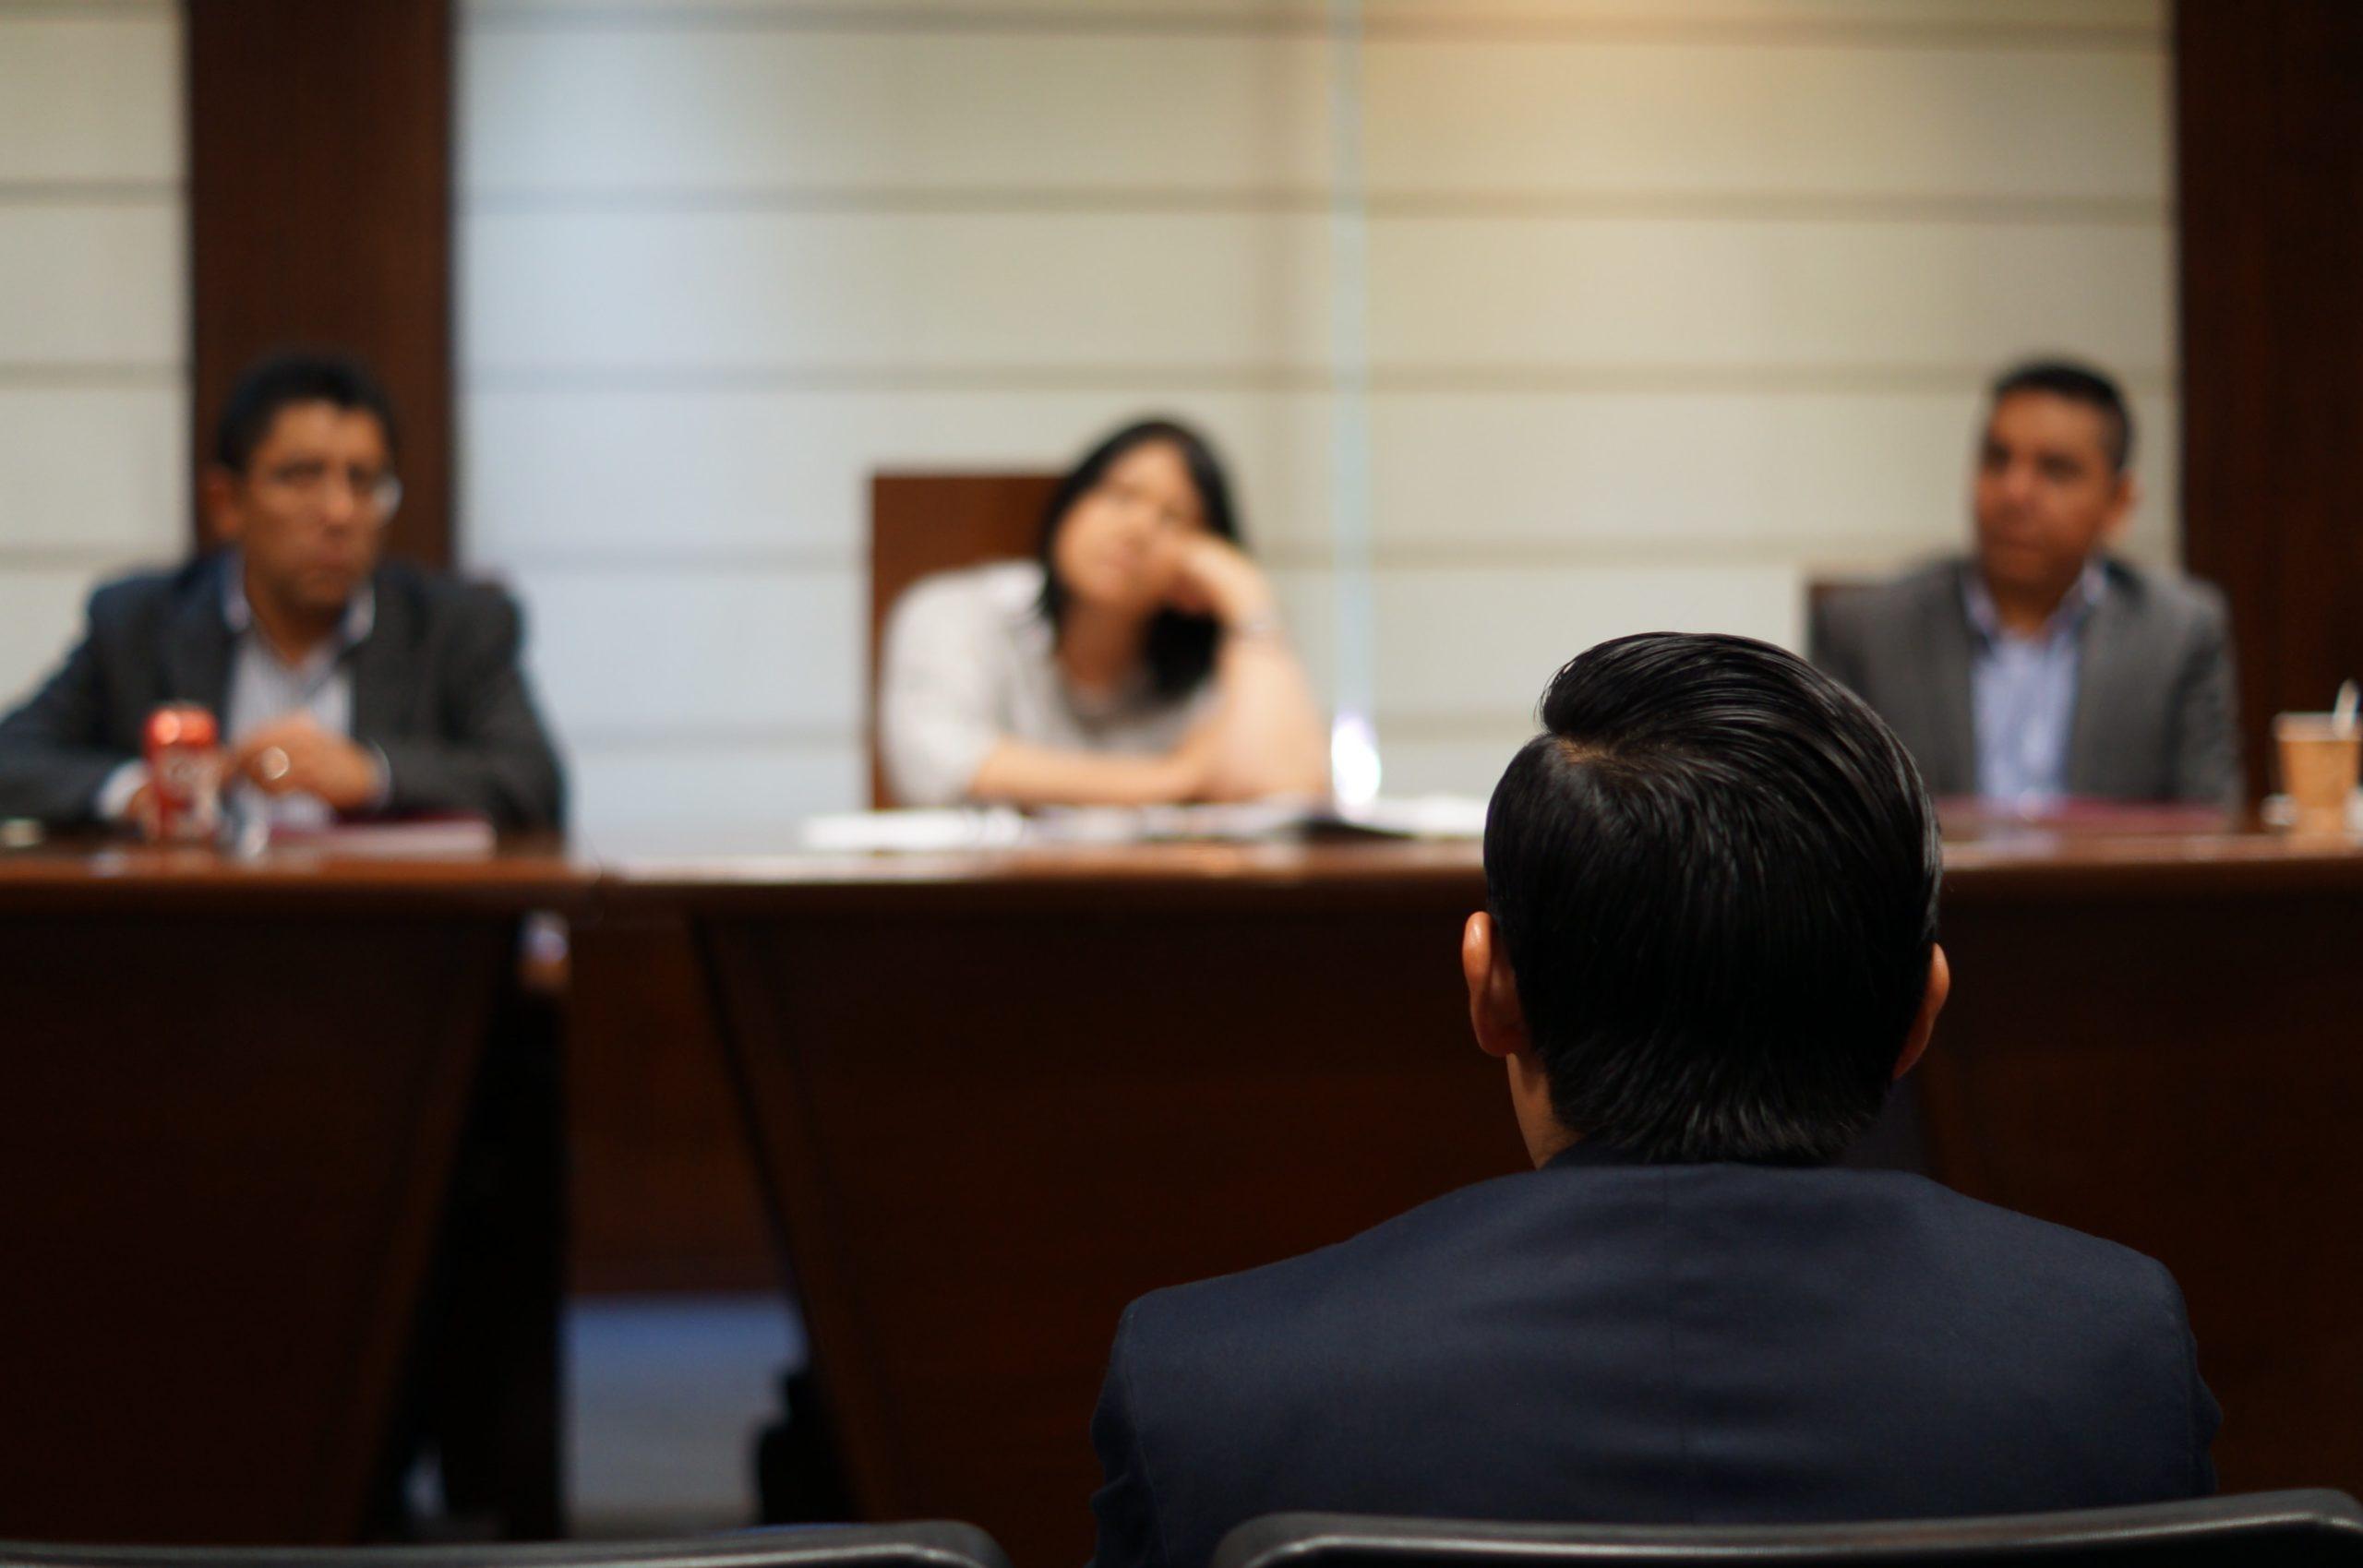 citación judicial como investigado